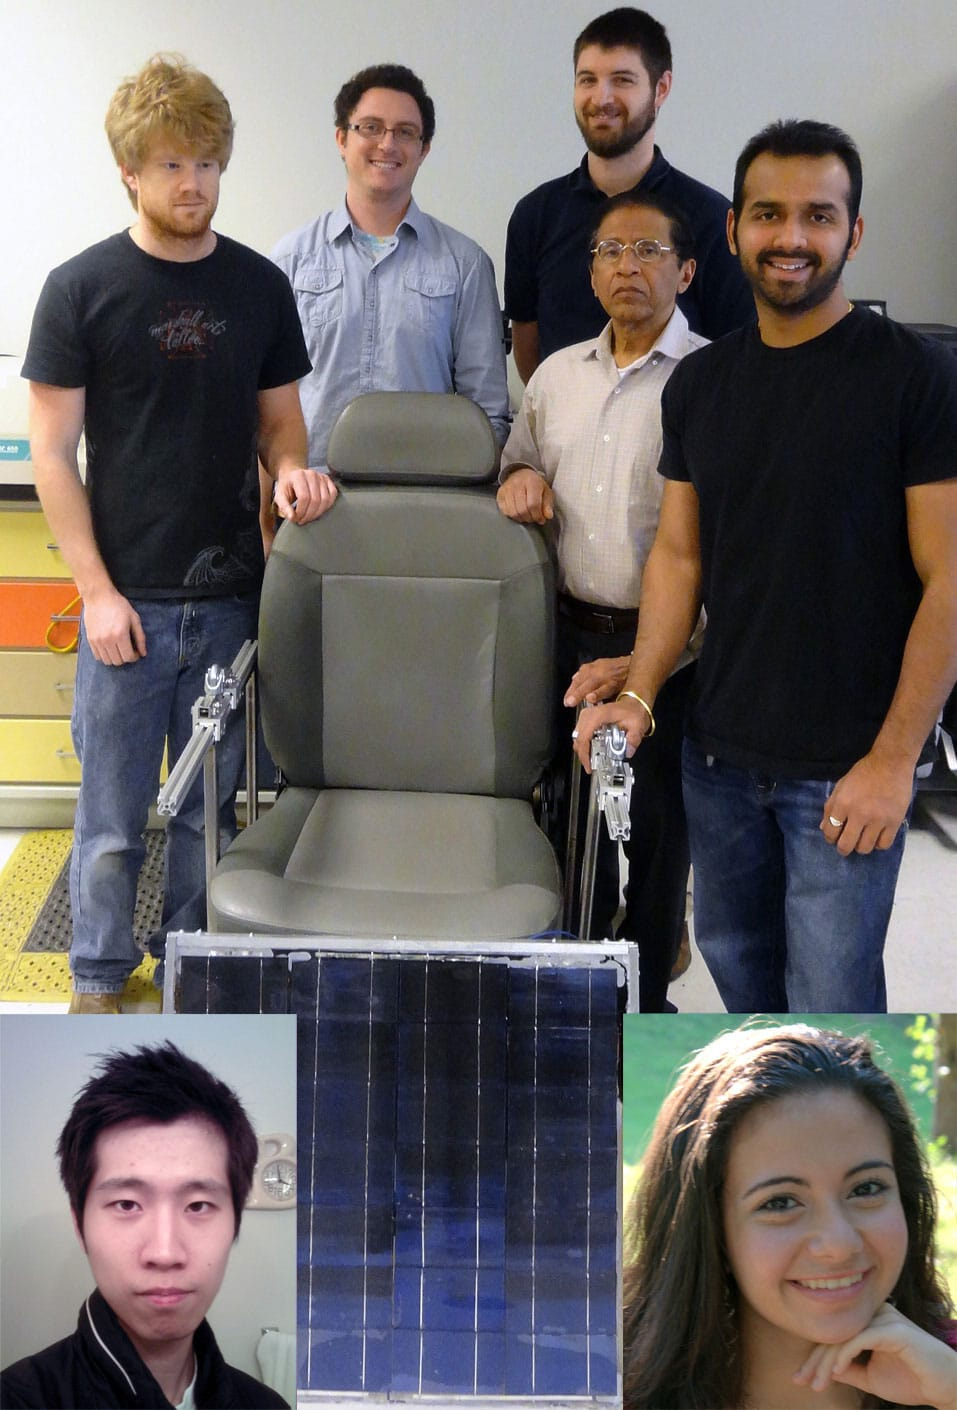 solar-powered-wheelchair-design